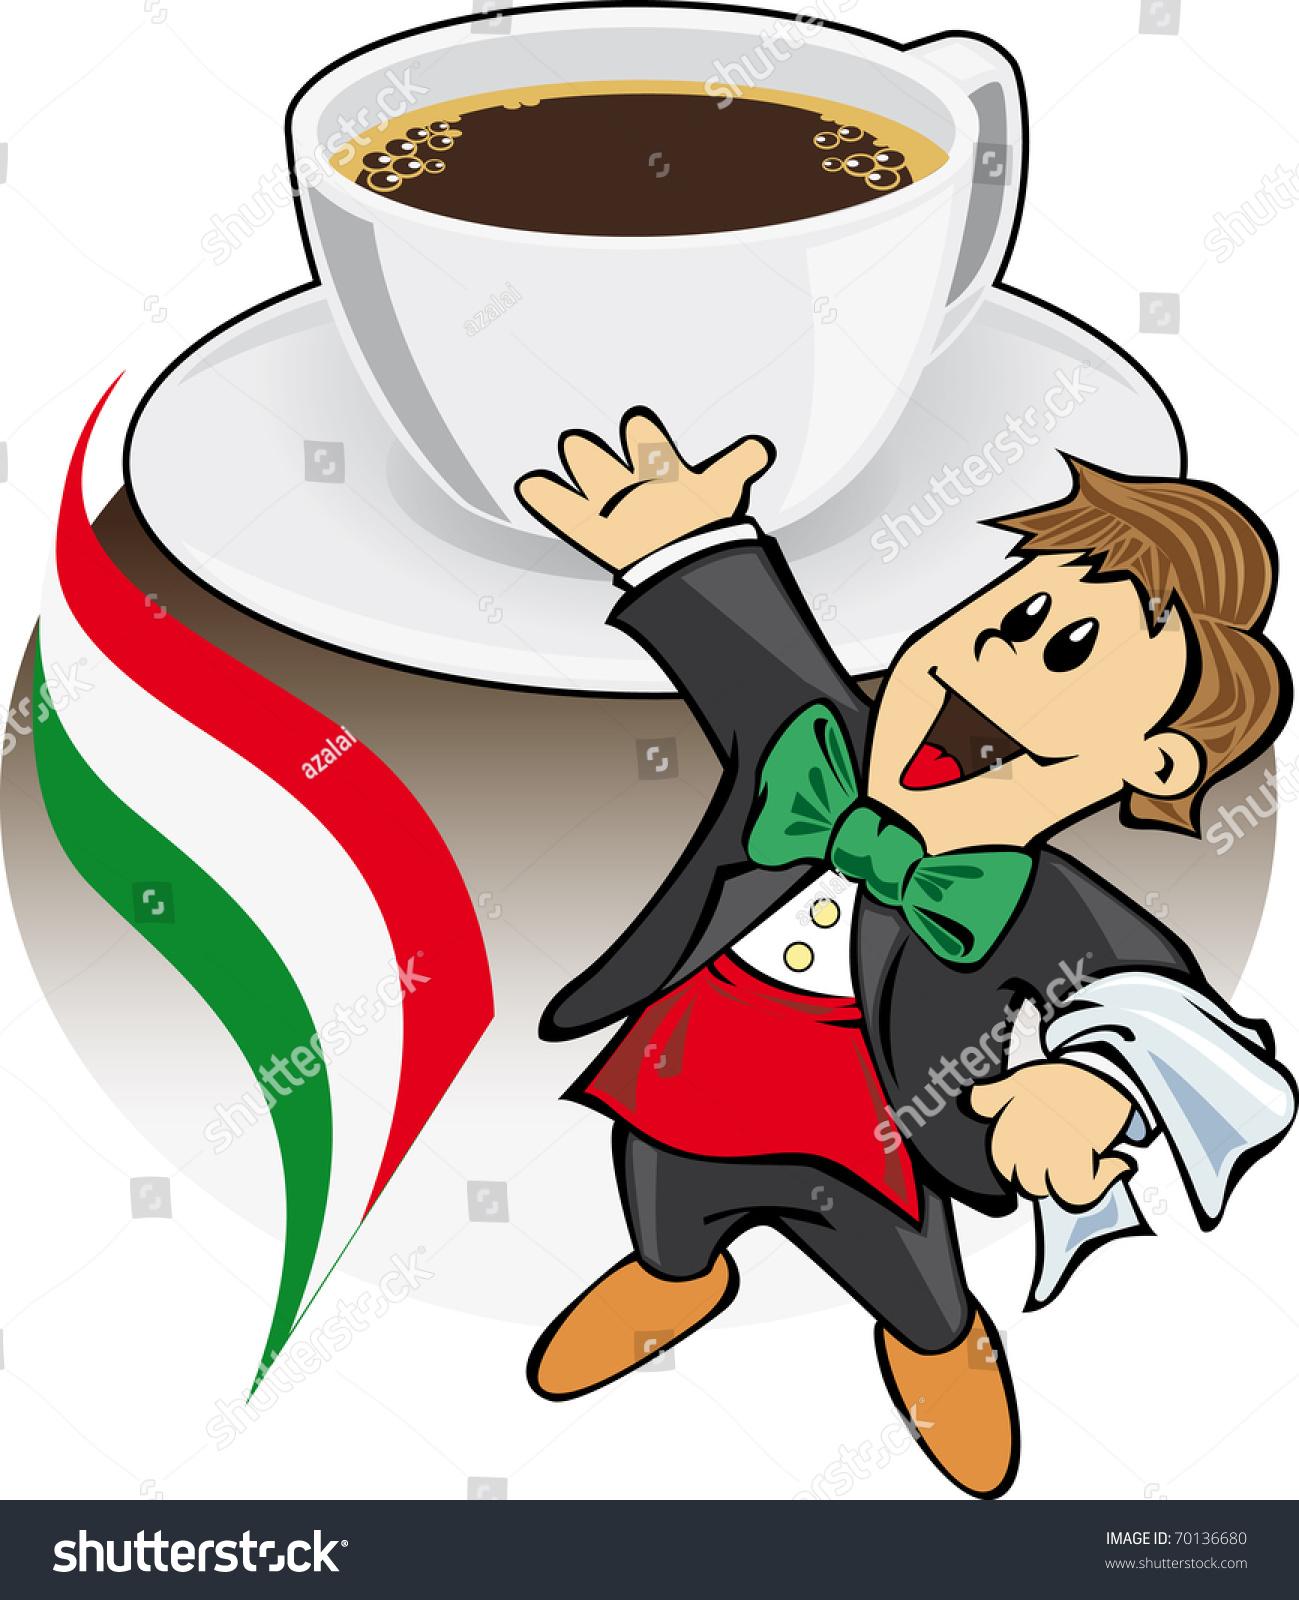 Italian Coffee Maker Vector : Espresso Coffee With Italian Waiter Stock Vector Illustration 70136680 : Shutterstock